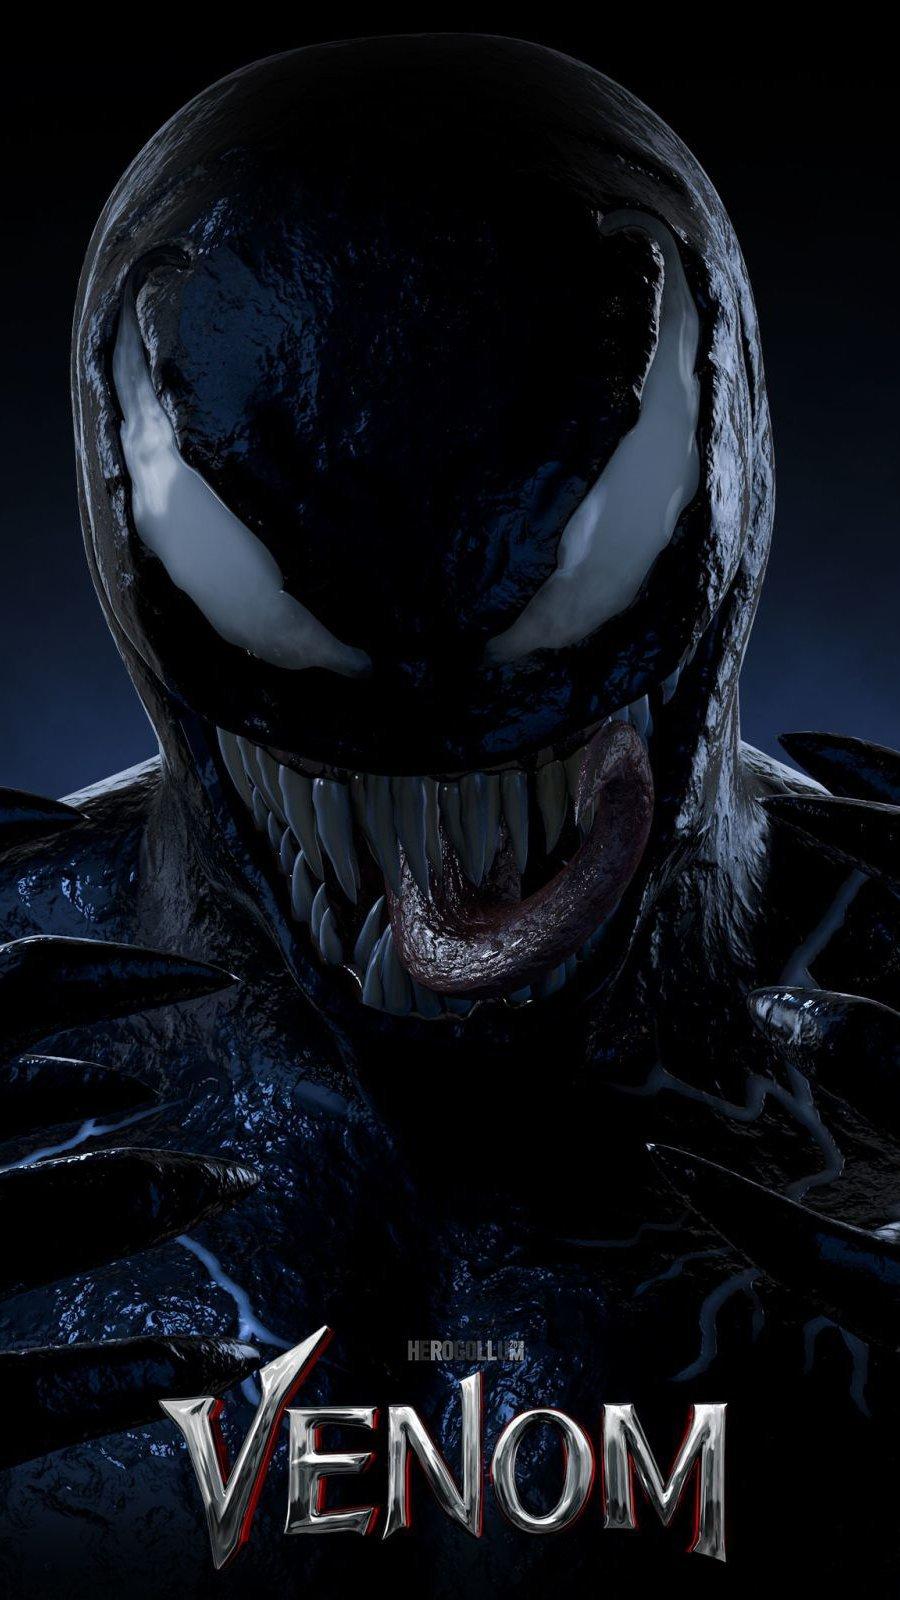 Wallpaper Venom 3D Vertical